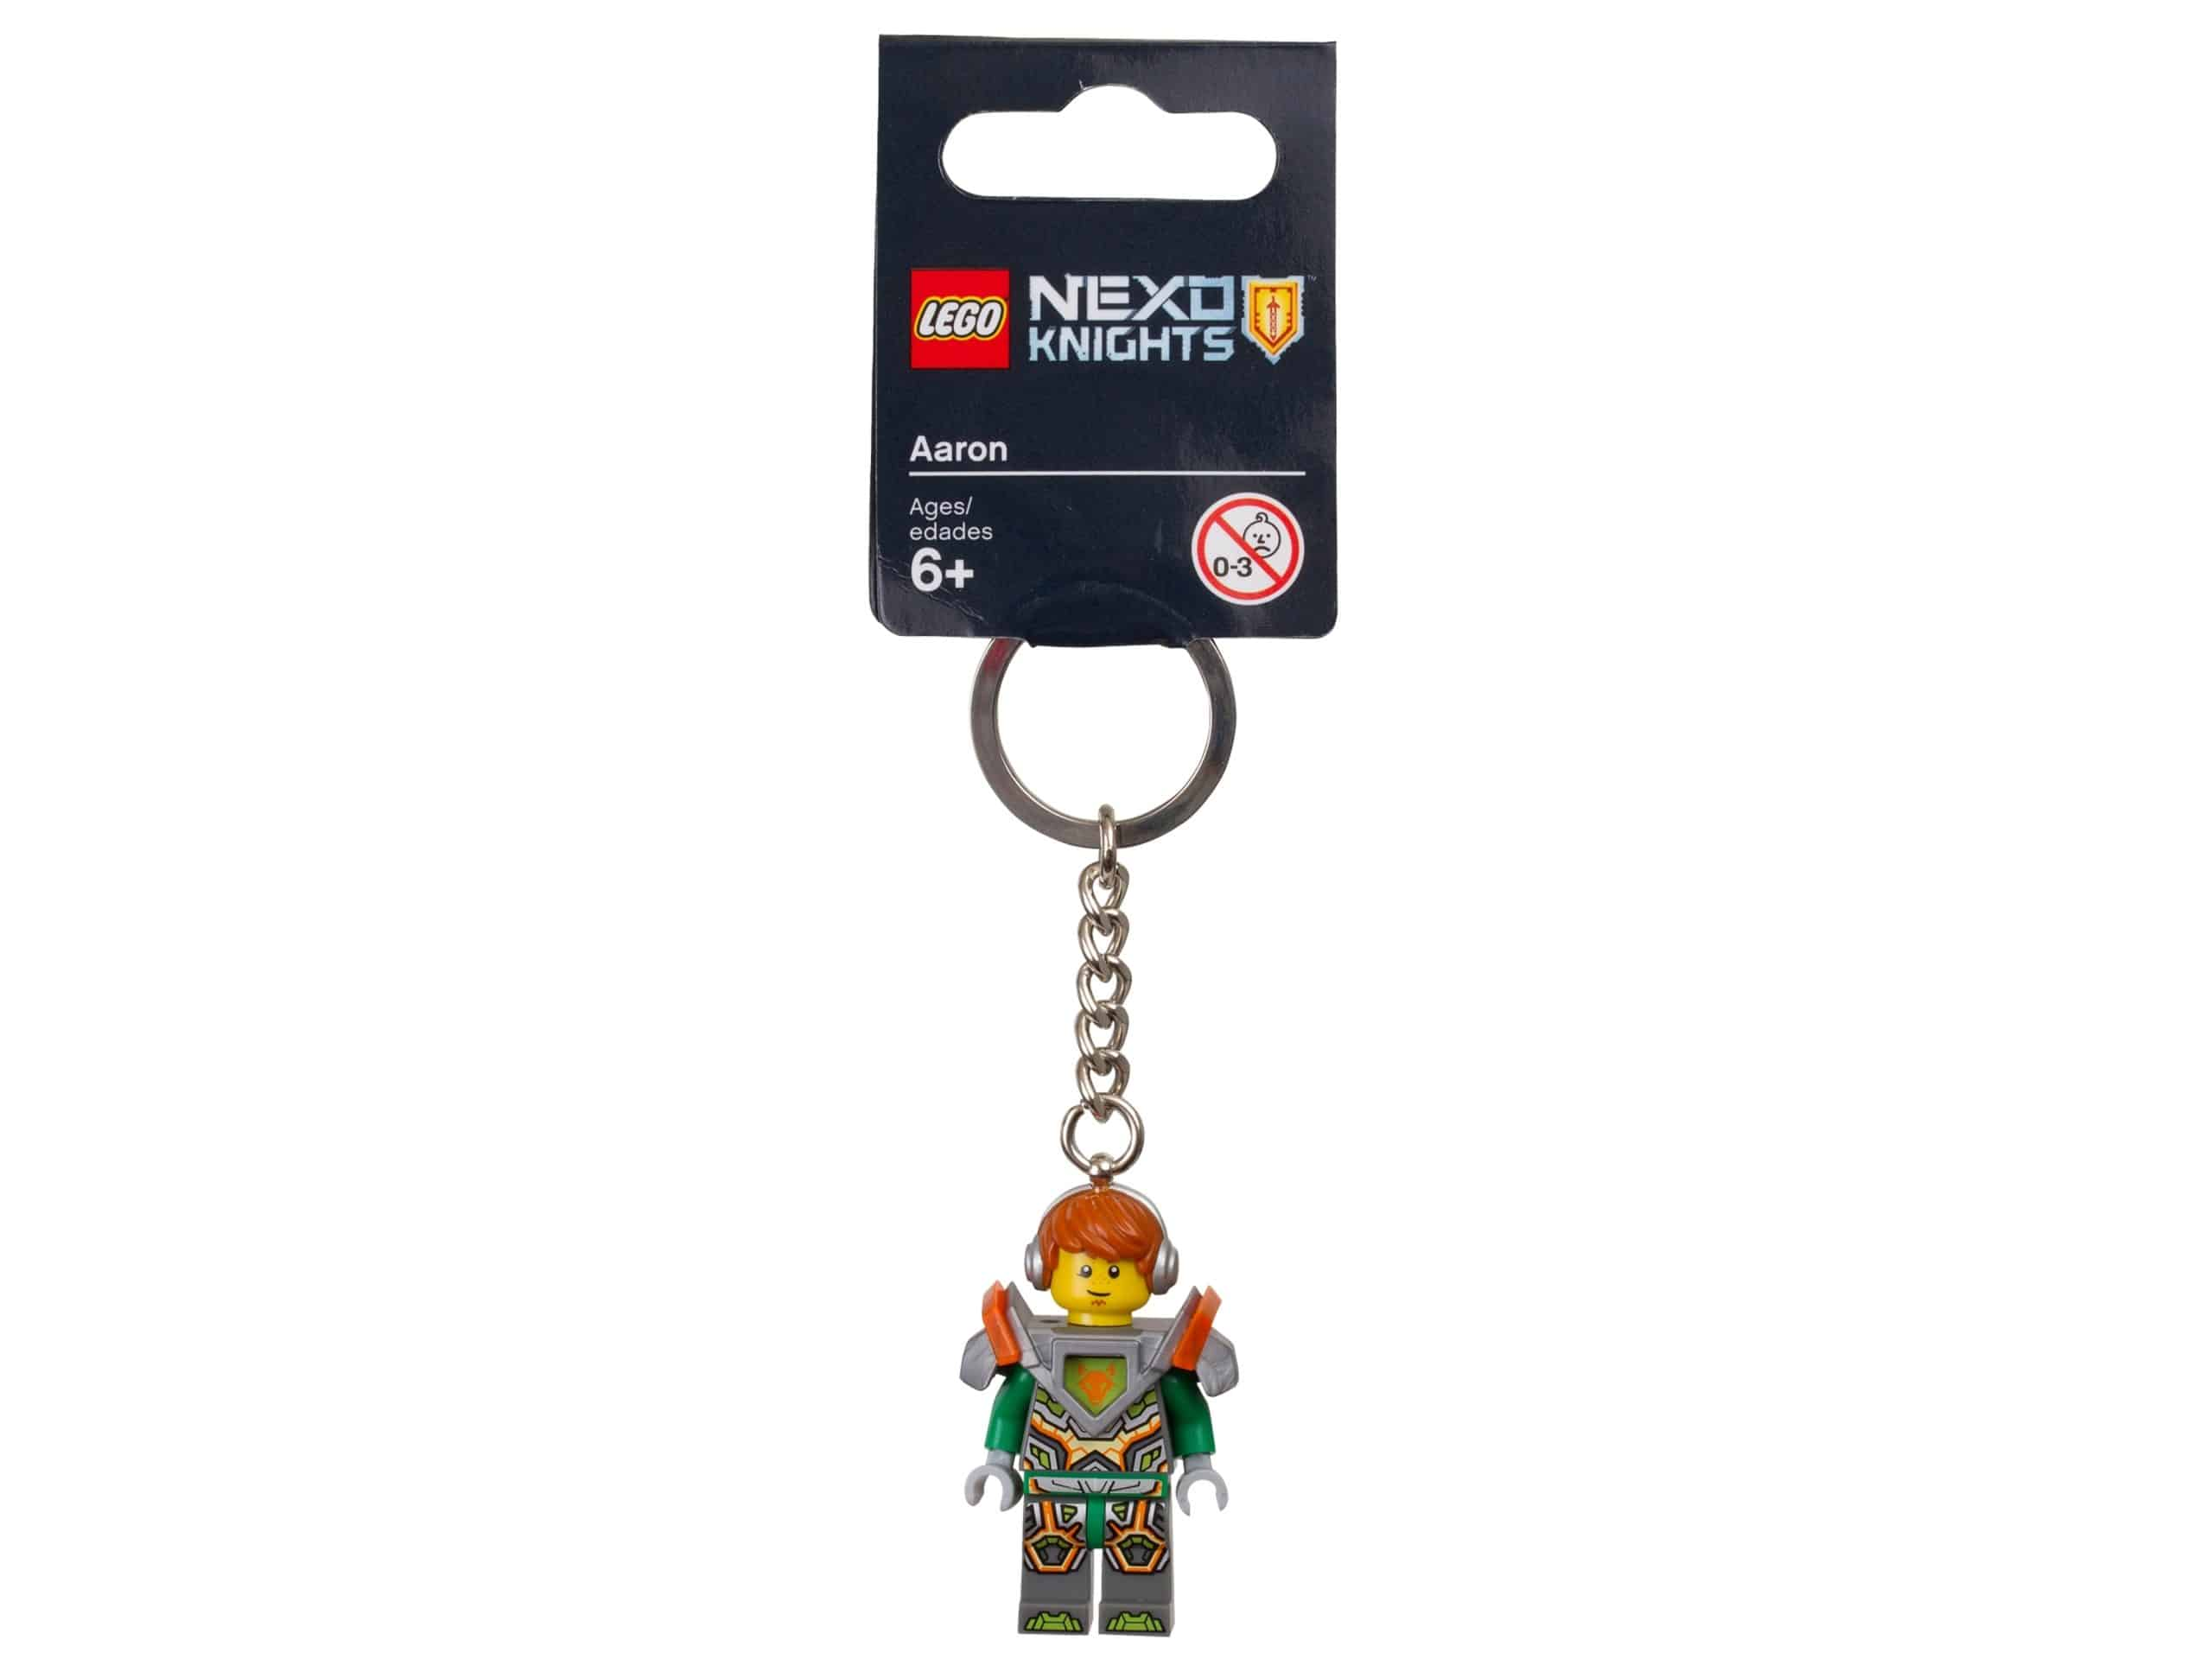 lego 853685 nexo knights aaron noglering scaled